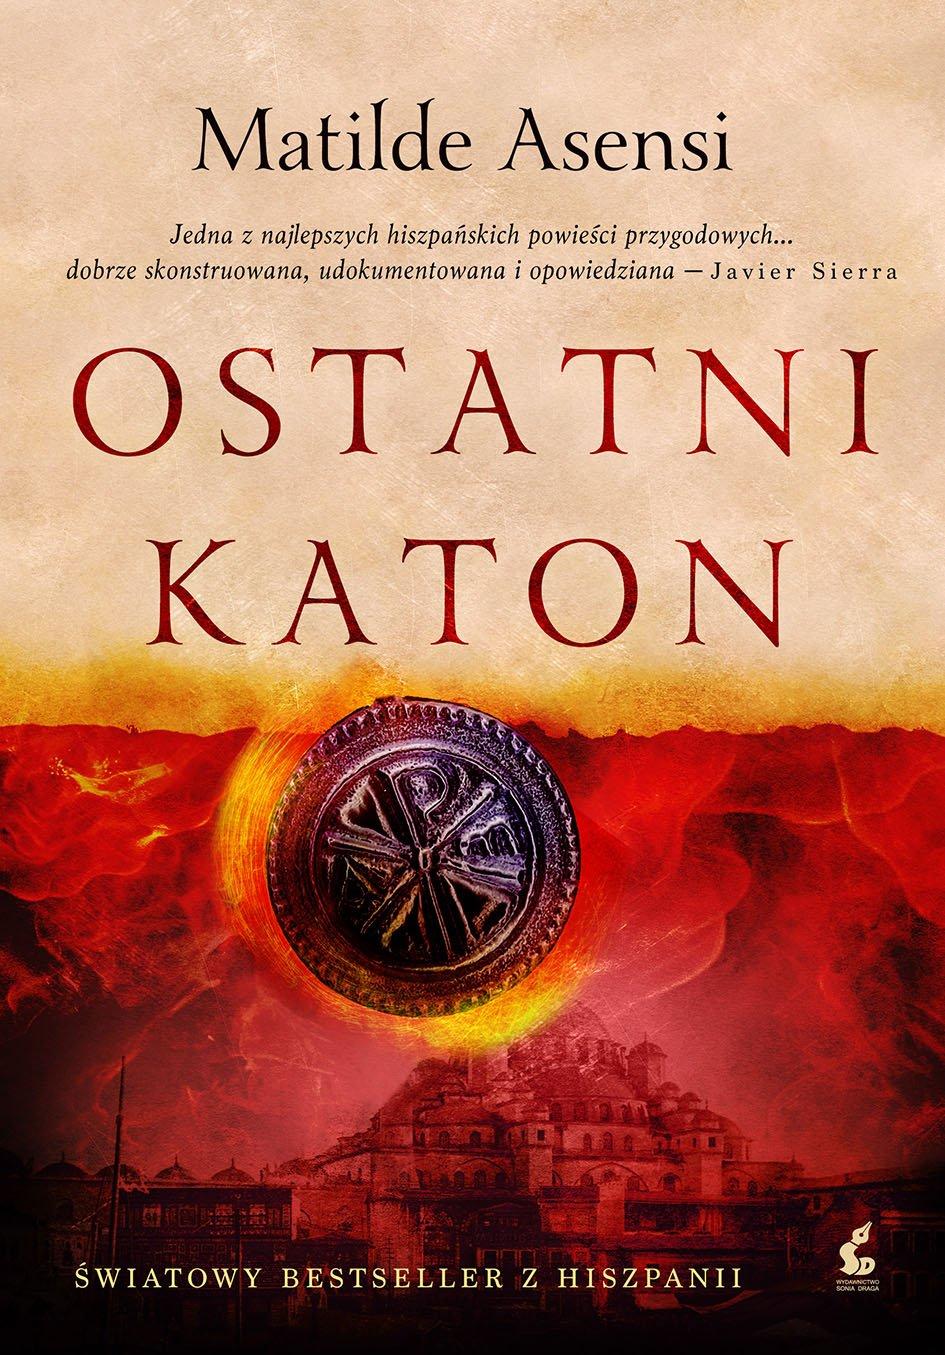 Ostatni Katon - Ebook (Książka na Kindle) do pobrania w formacie MOBI